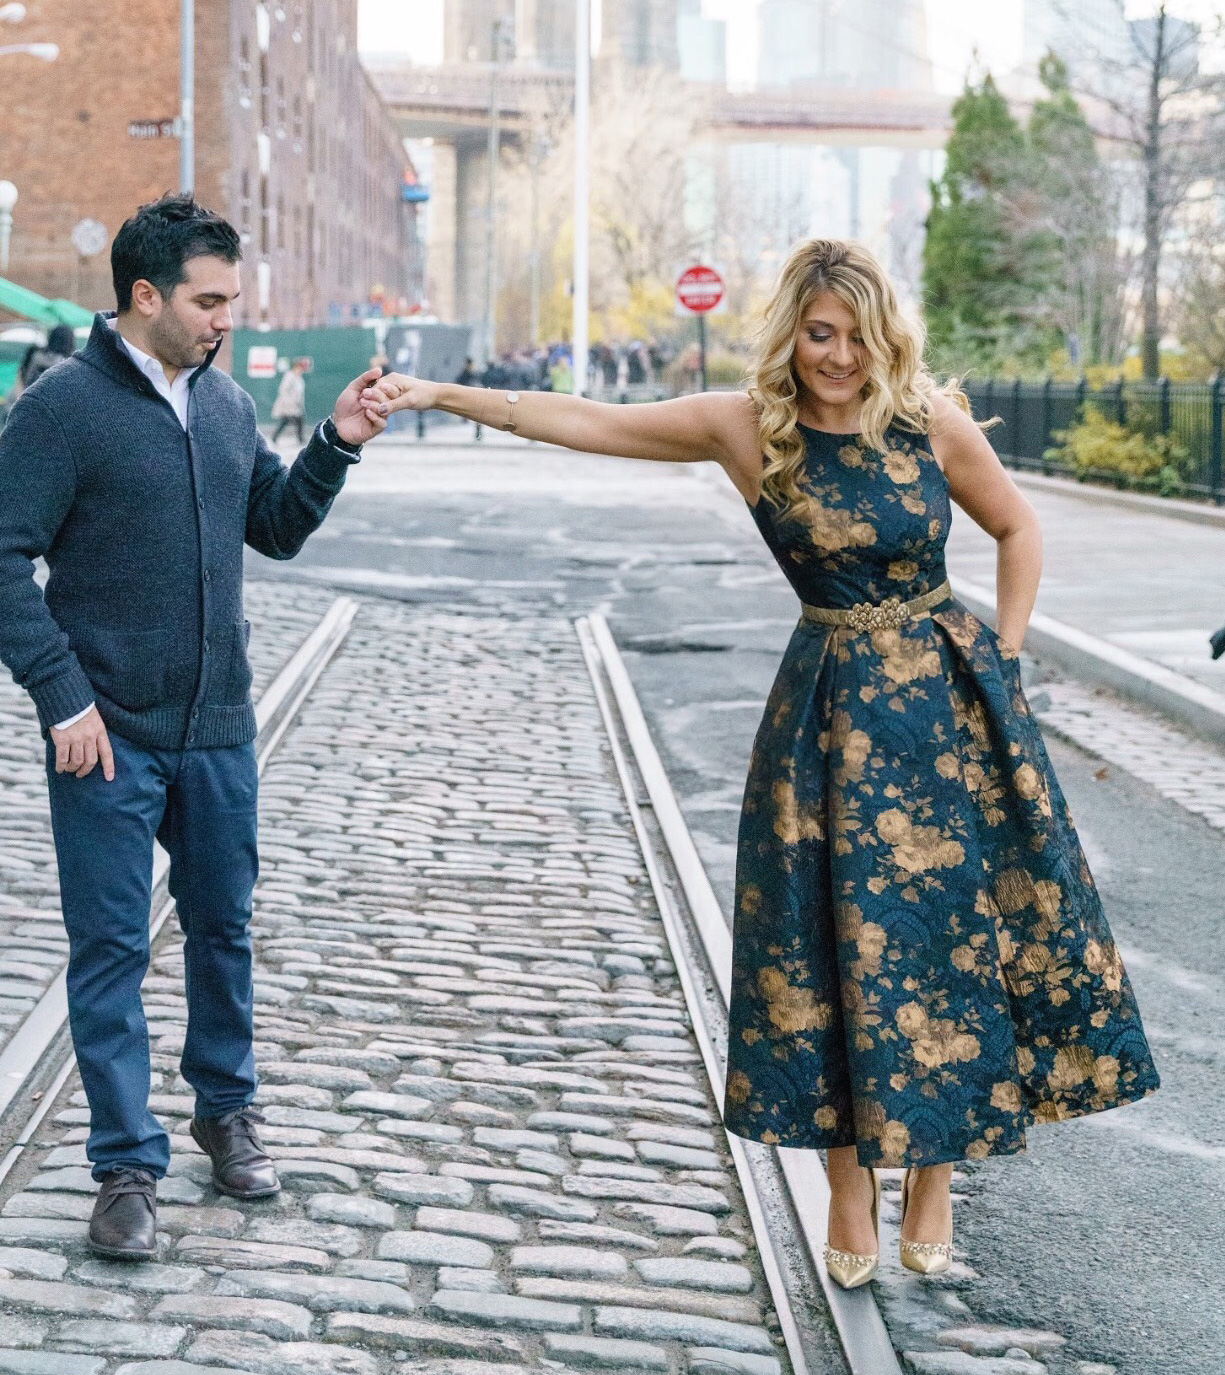 Katrina Mitzeliotis navy blue and gold dress engagement photo shoot in Tribeca New York City